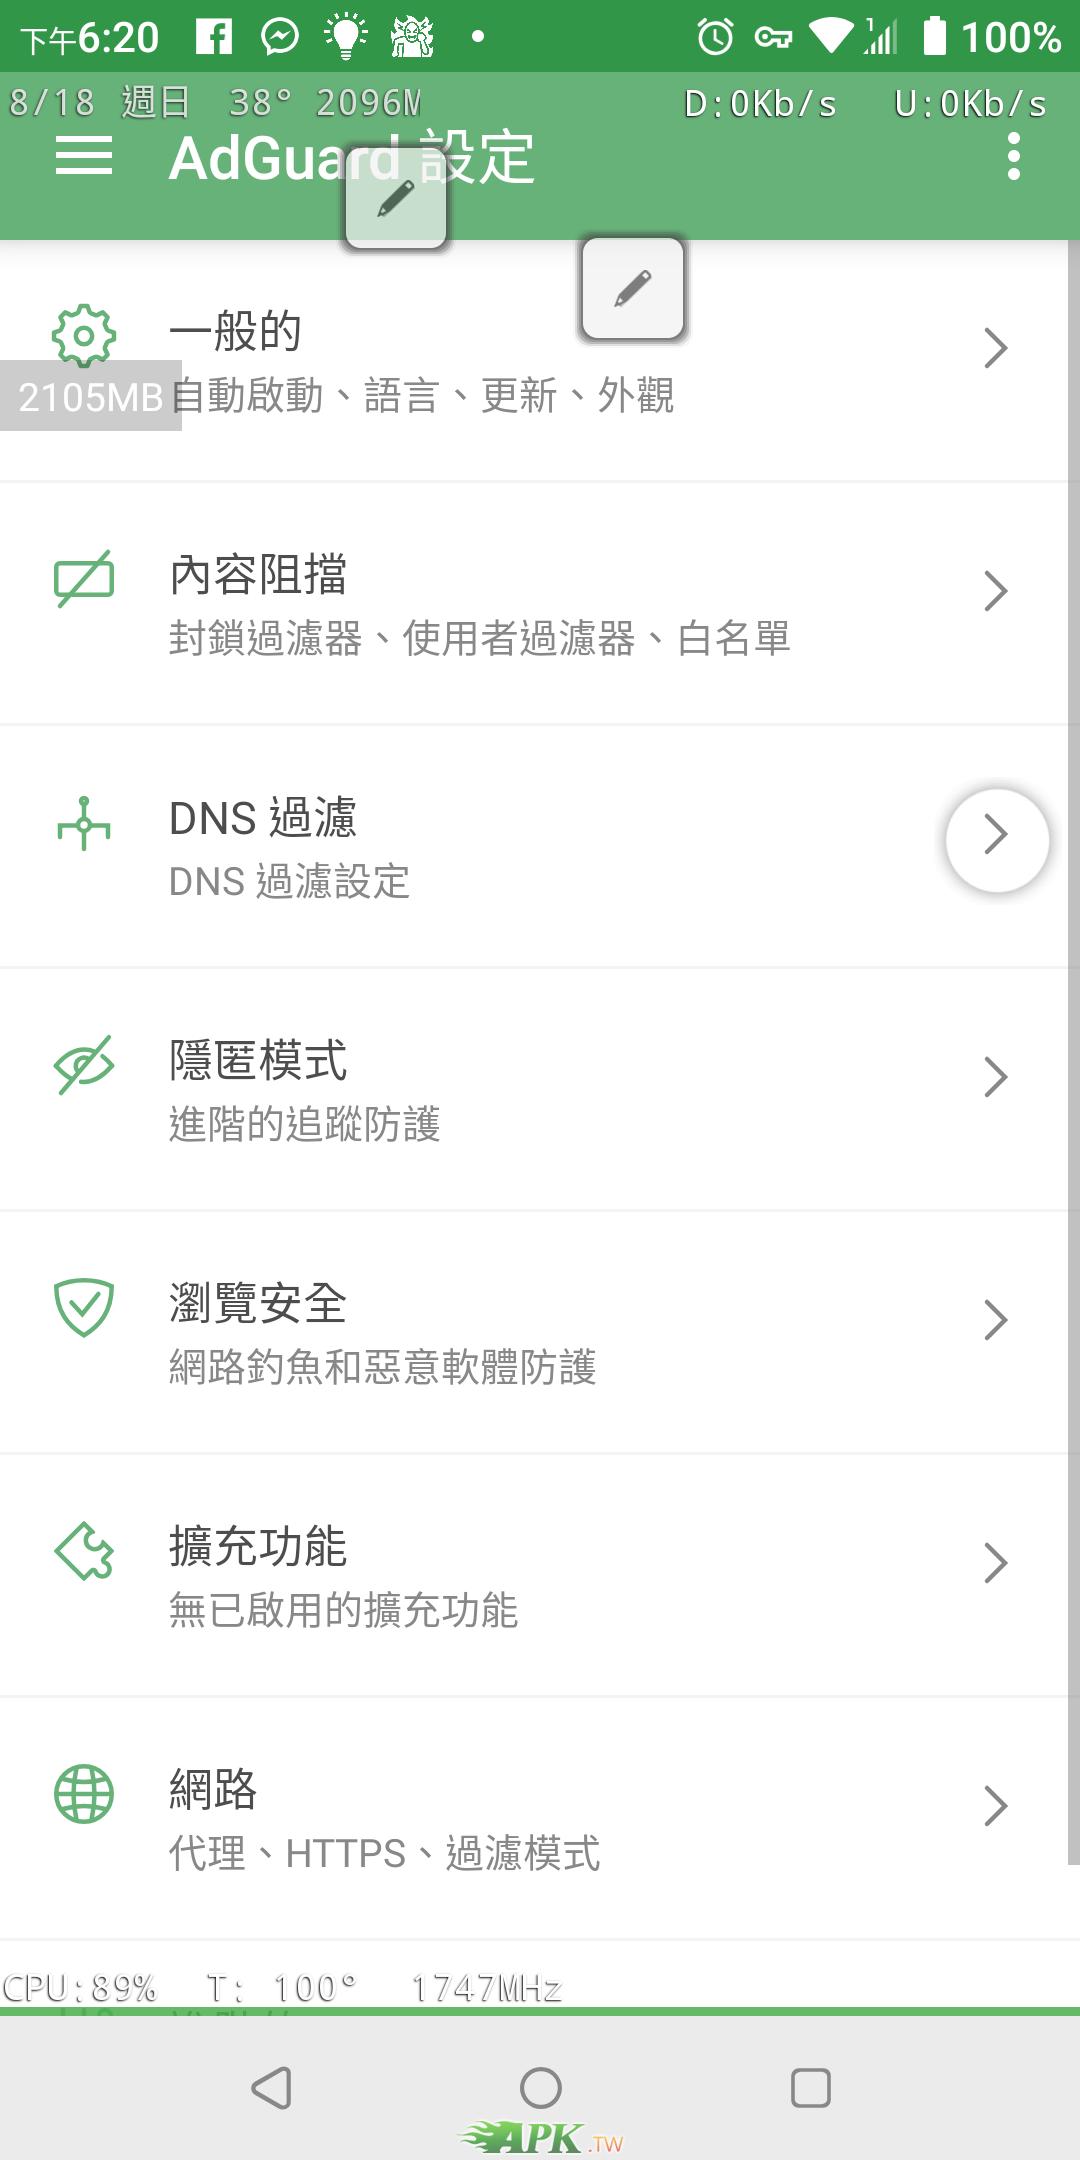 Screenshot_20190818-182053.png